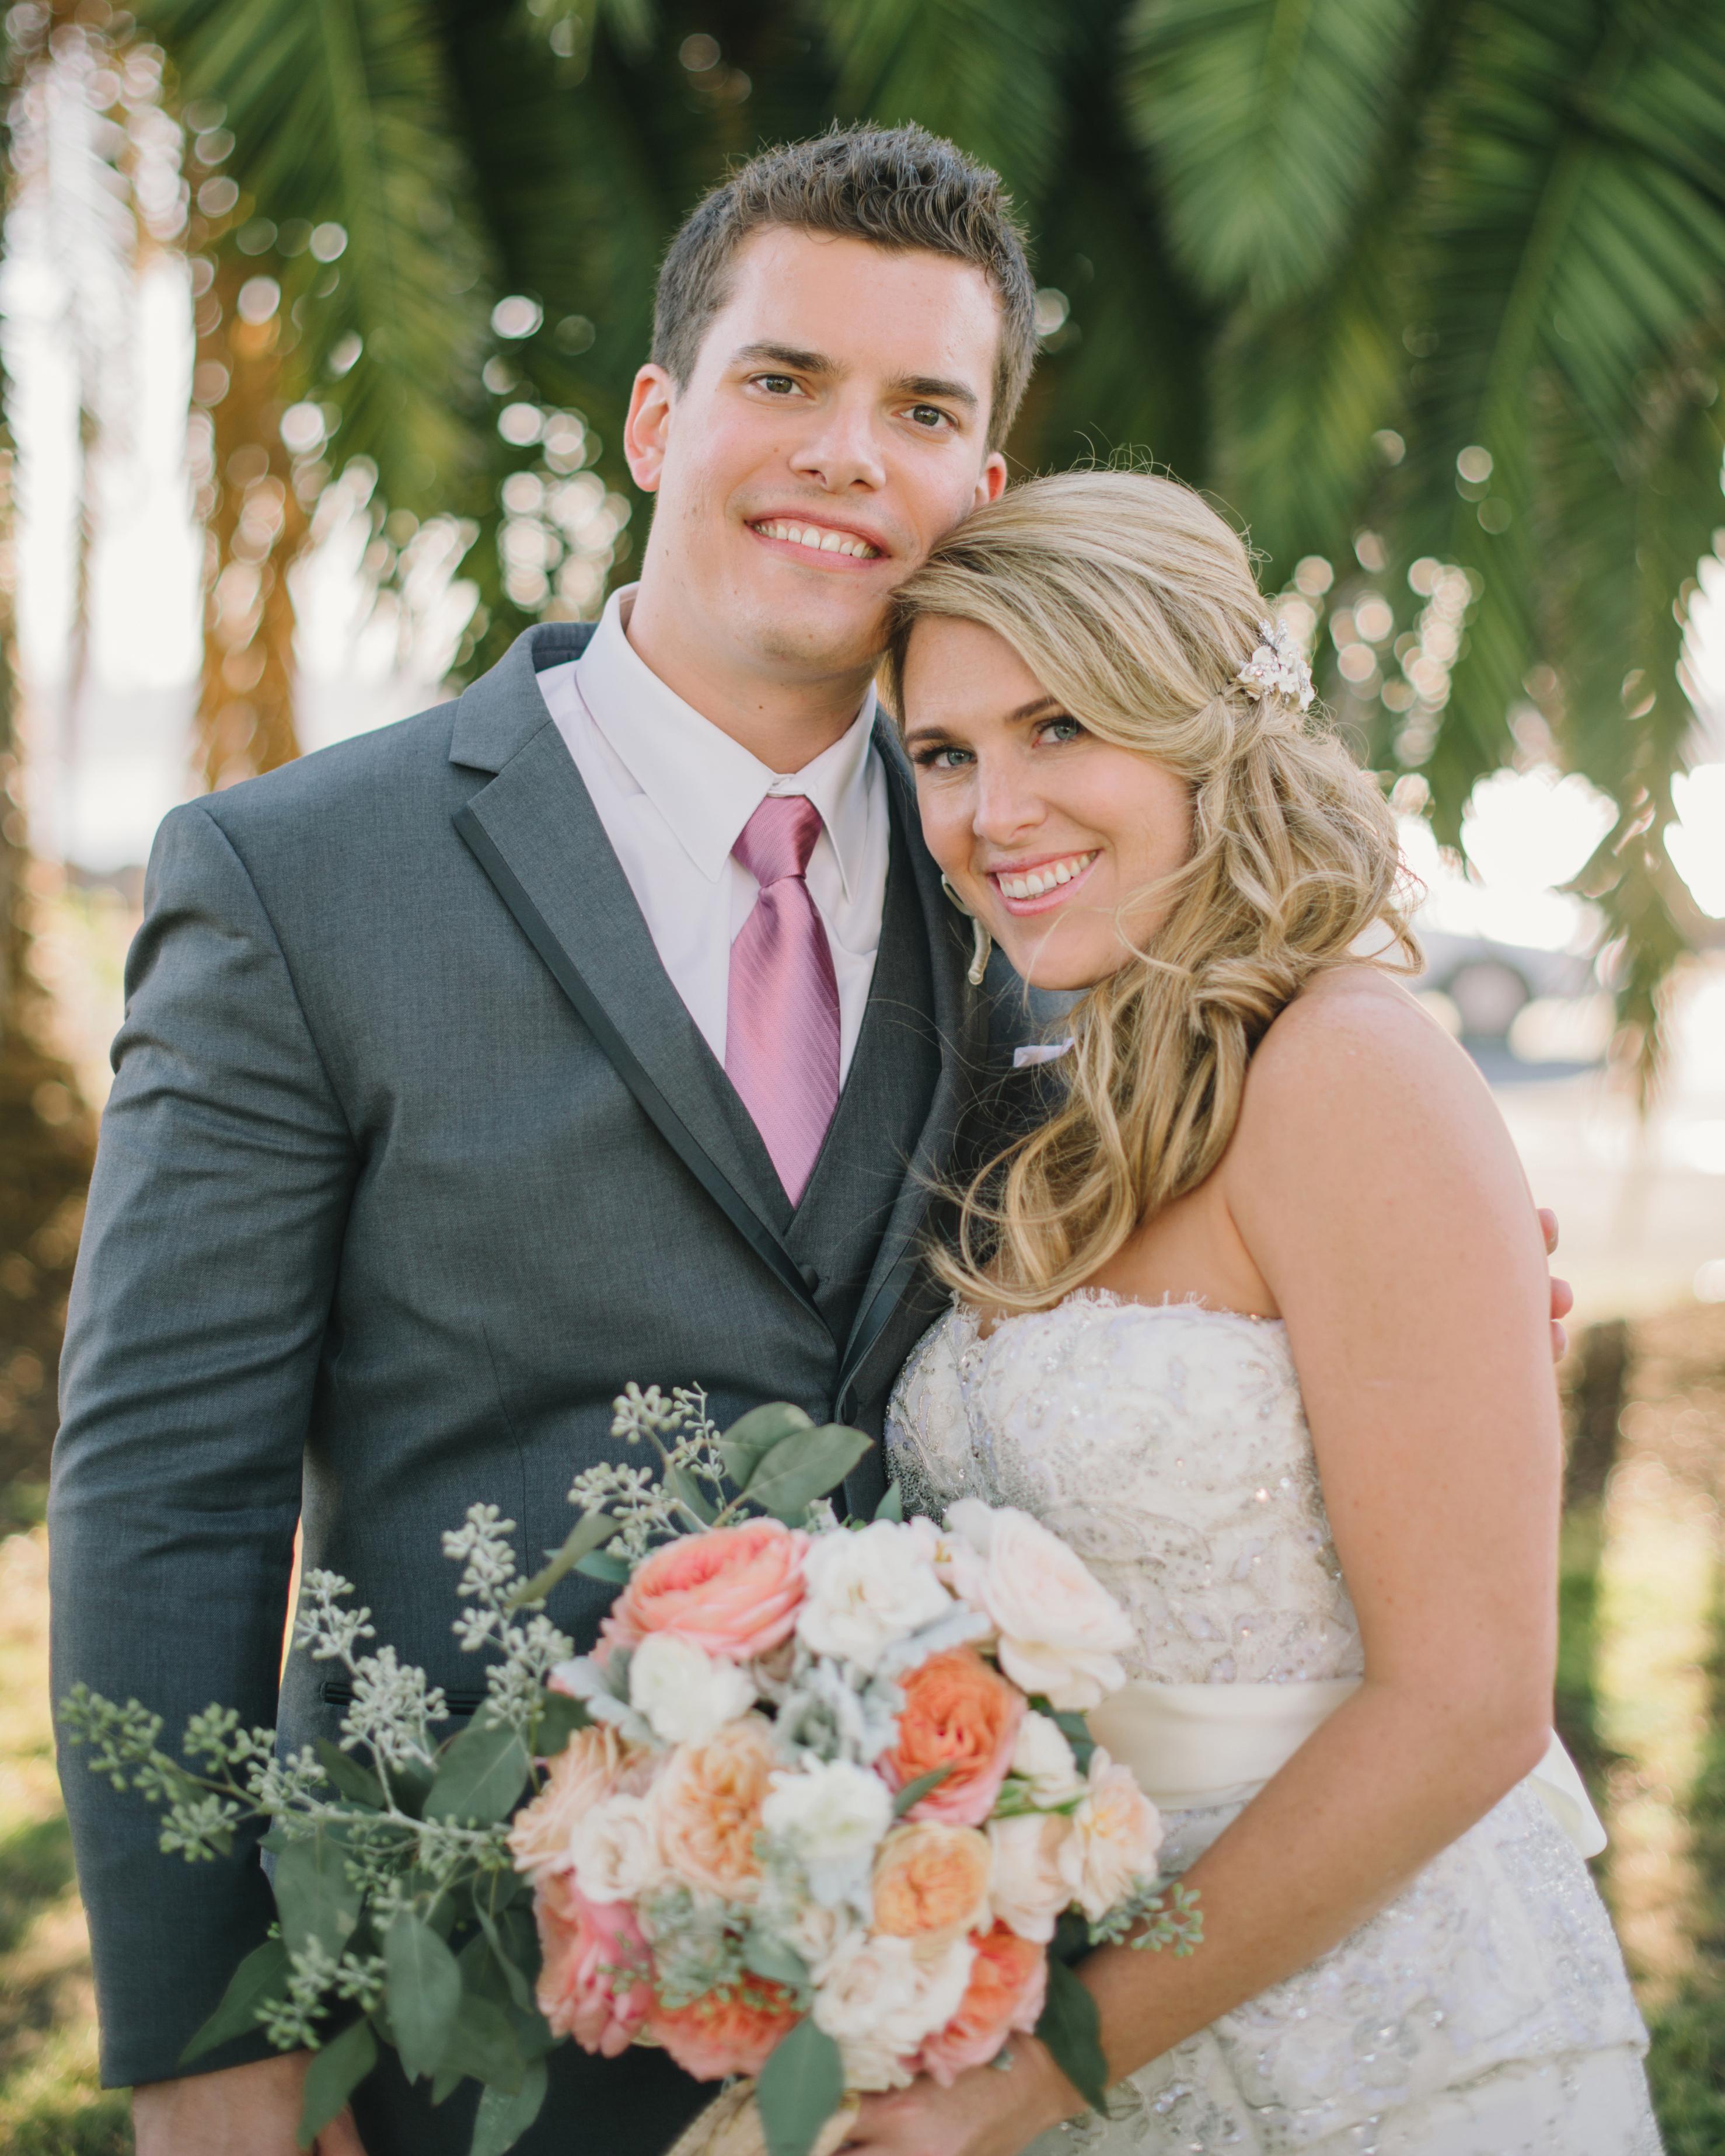 alex-brandon-wedding-portrait2-072-s111338-0714.jpg